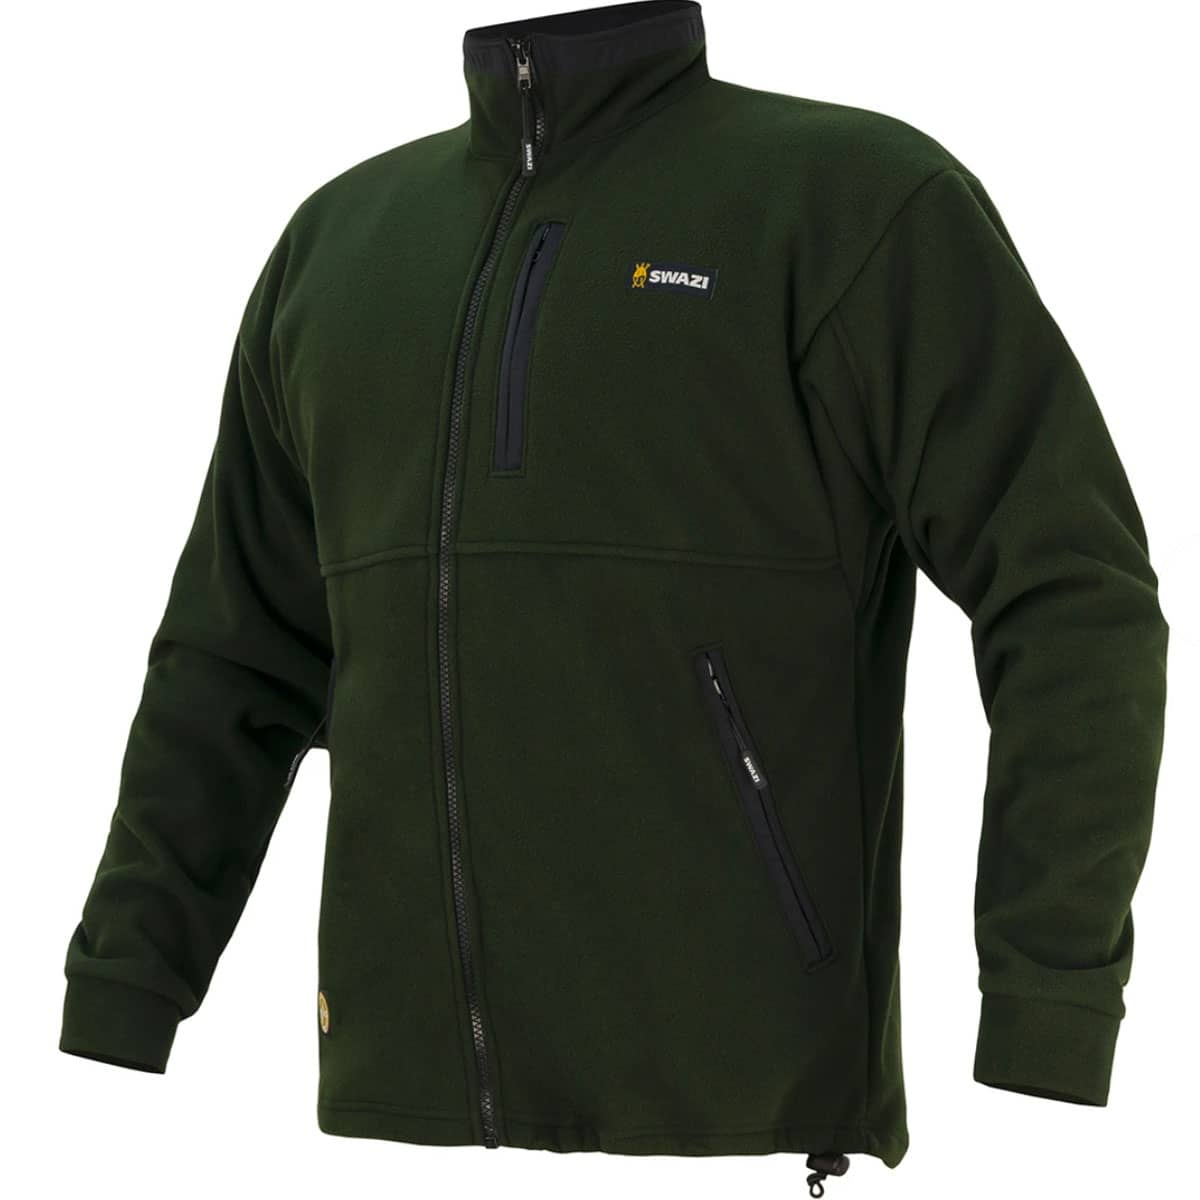 Swazi Molesworth Mens' AEGIS® Fleece Jacket